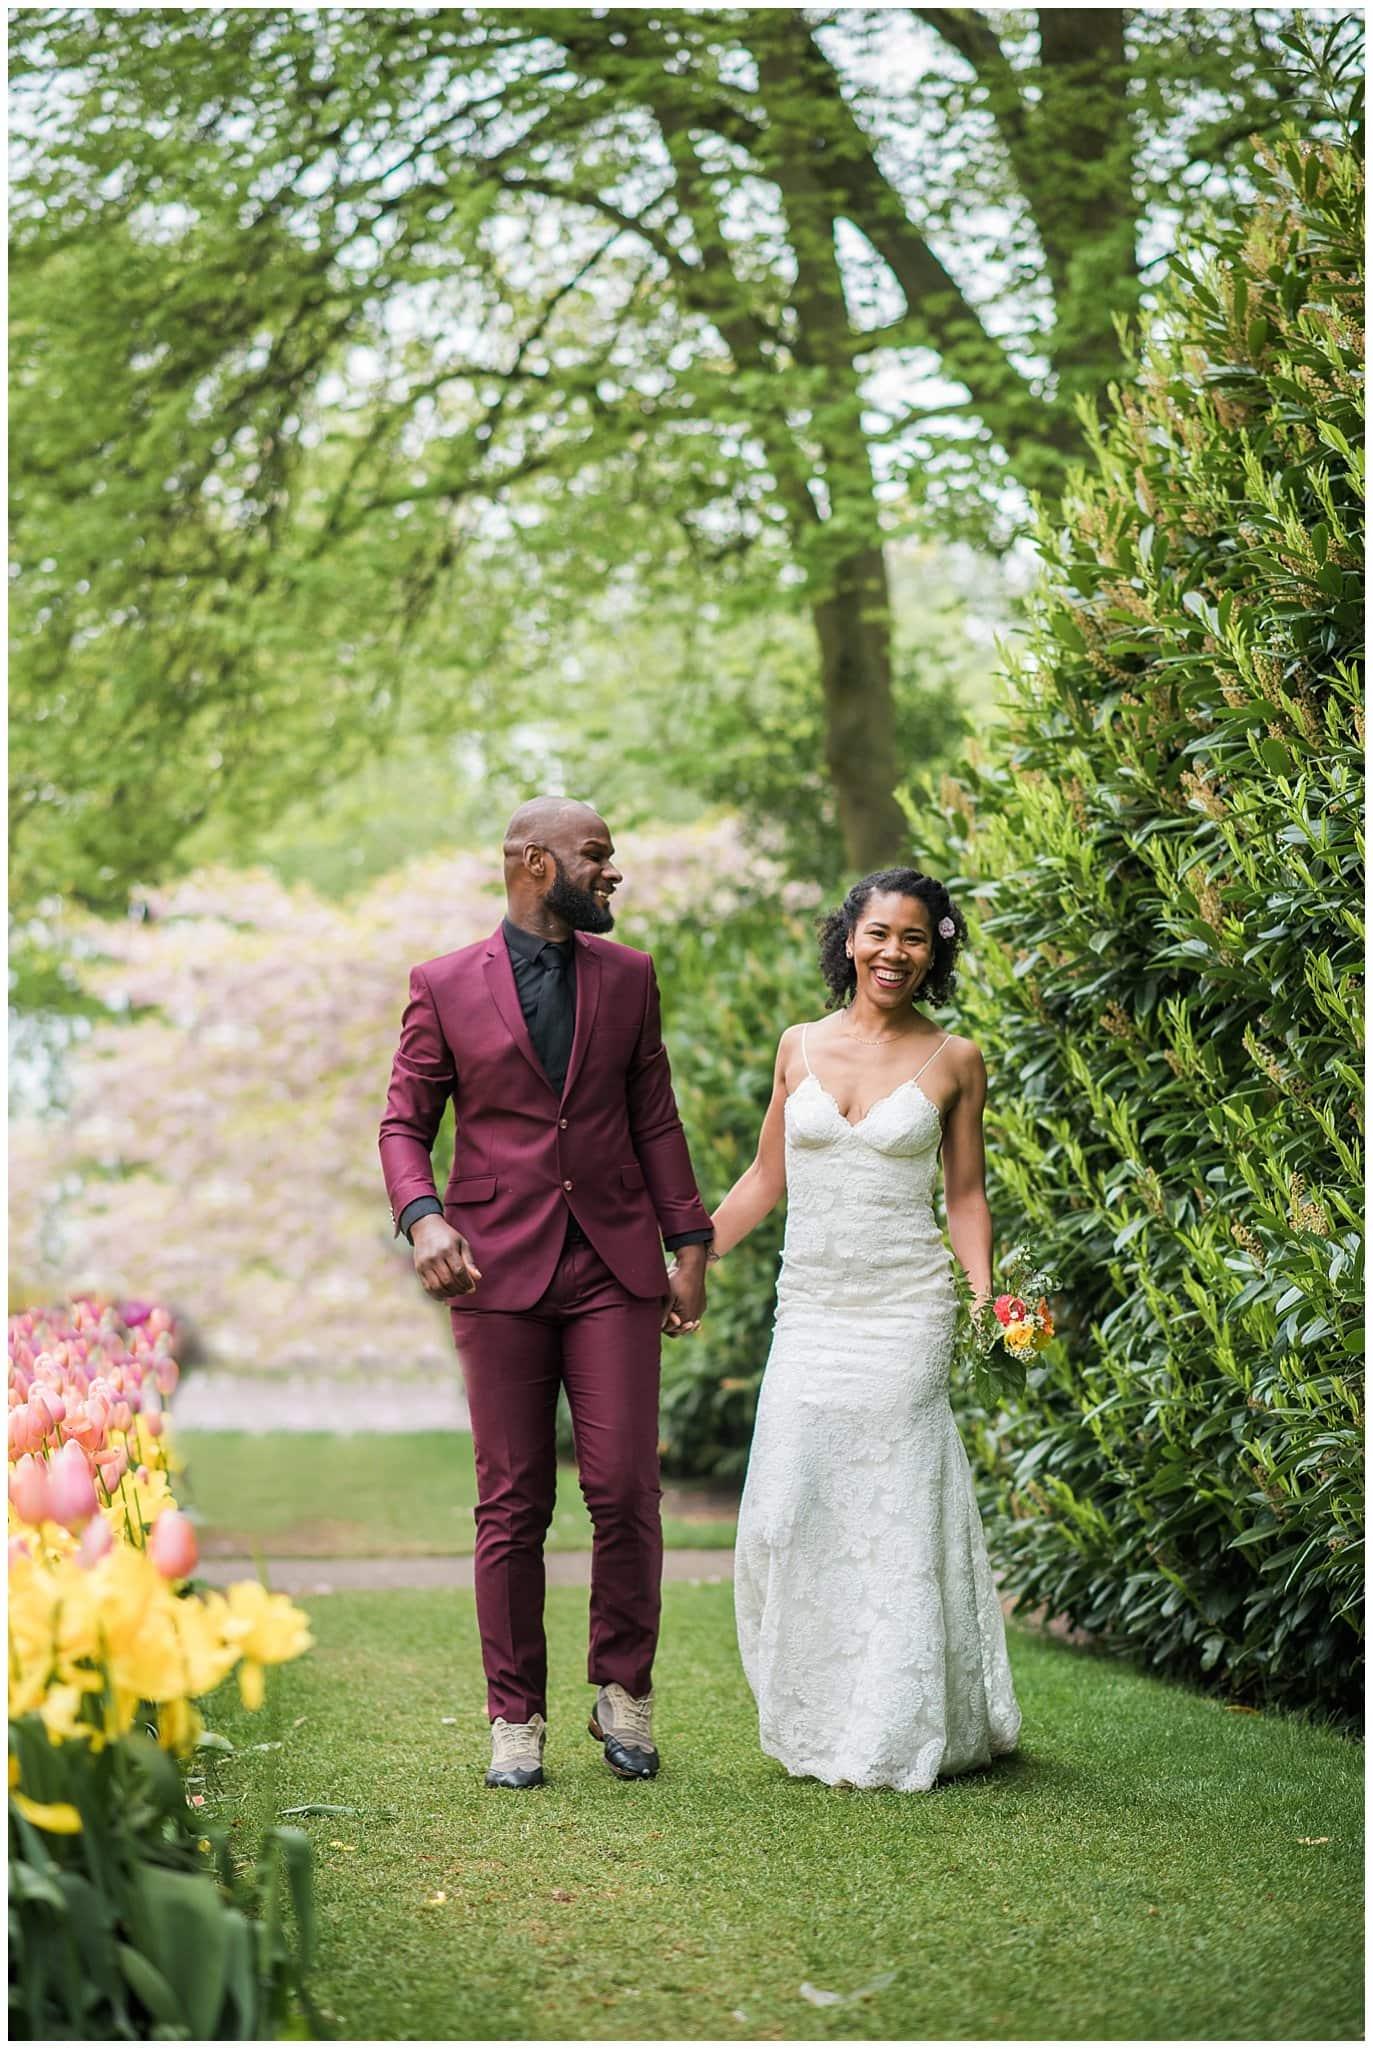 couple walking in tulip field in Natherlands